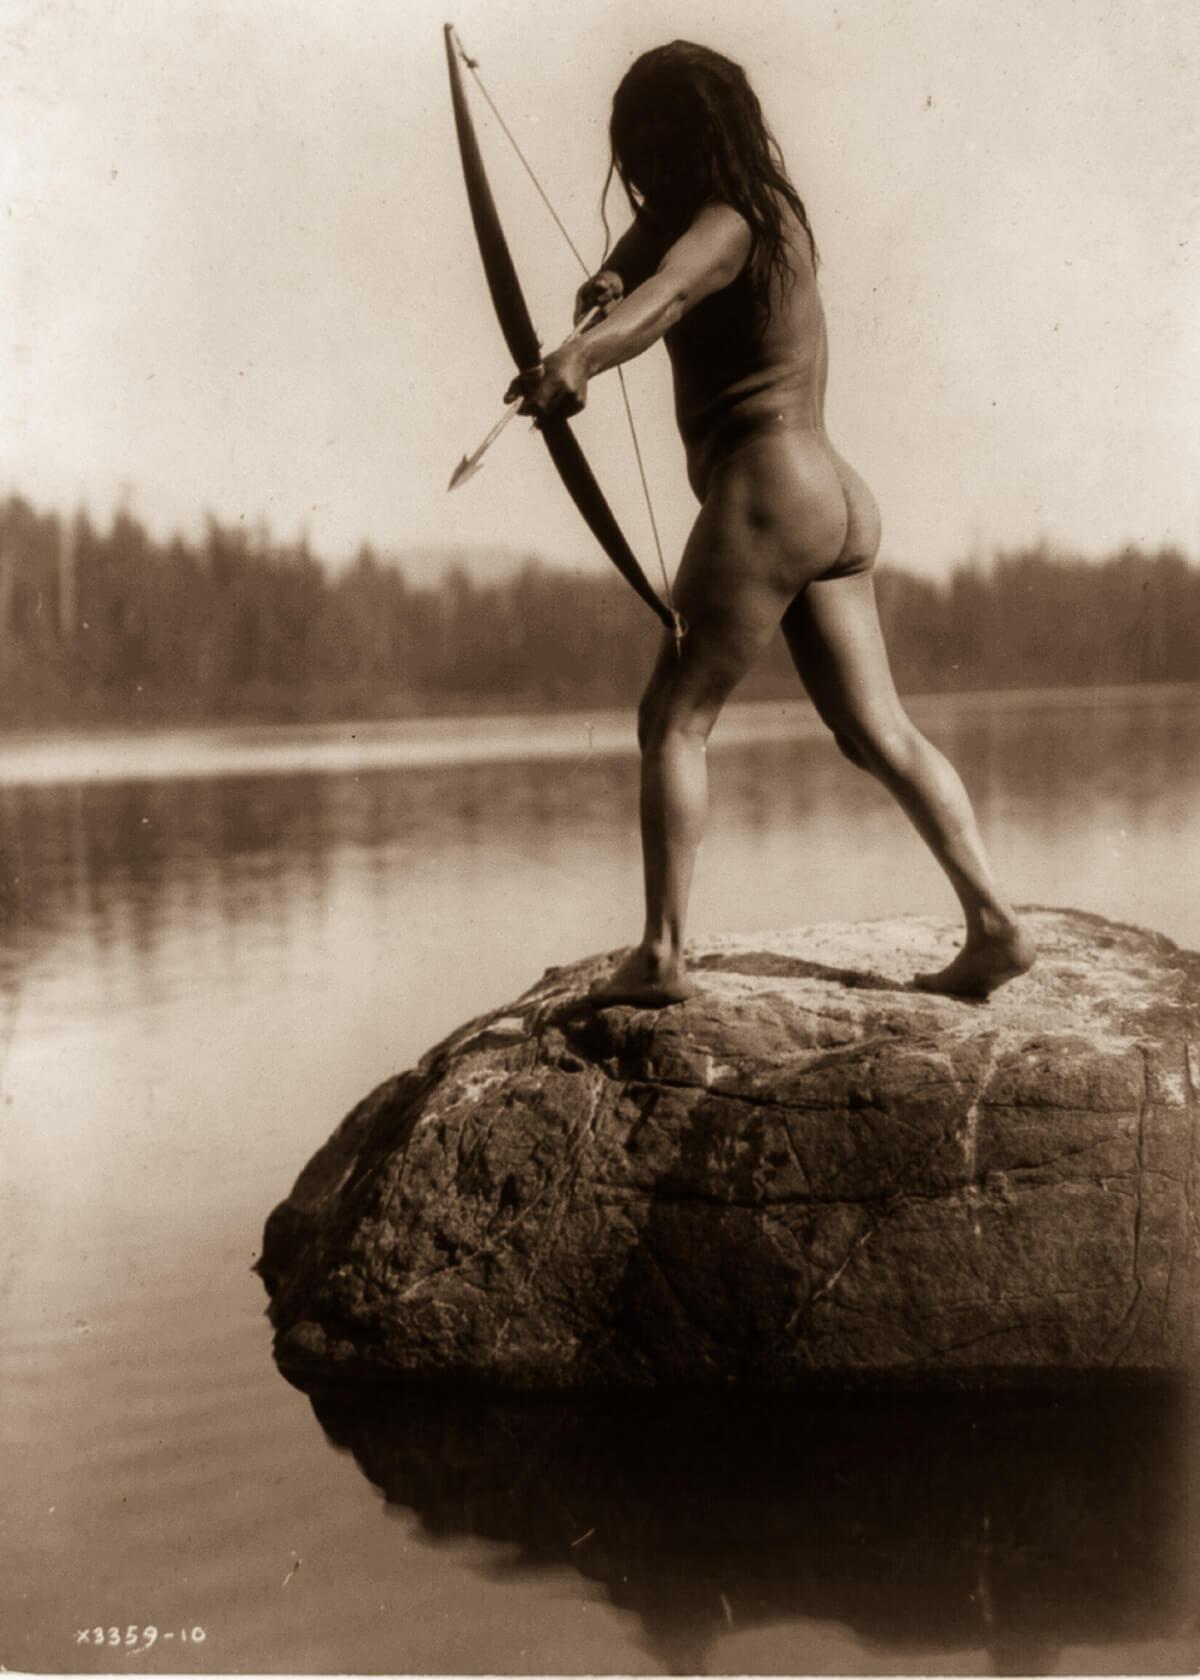 NativeAmerican-fotografia-oldskull-20